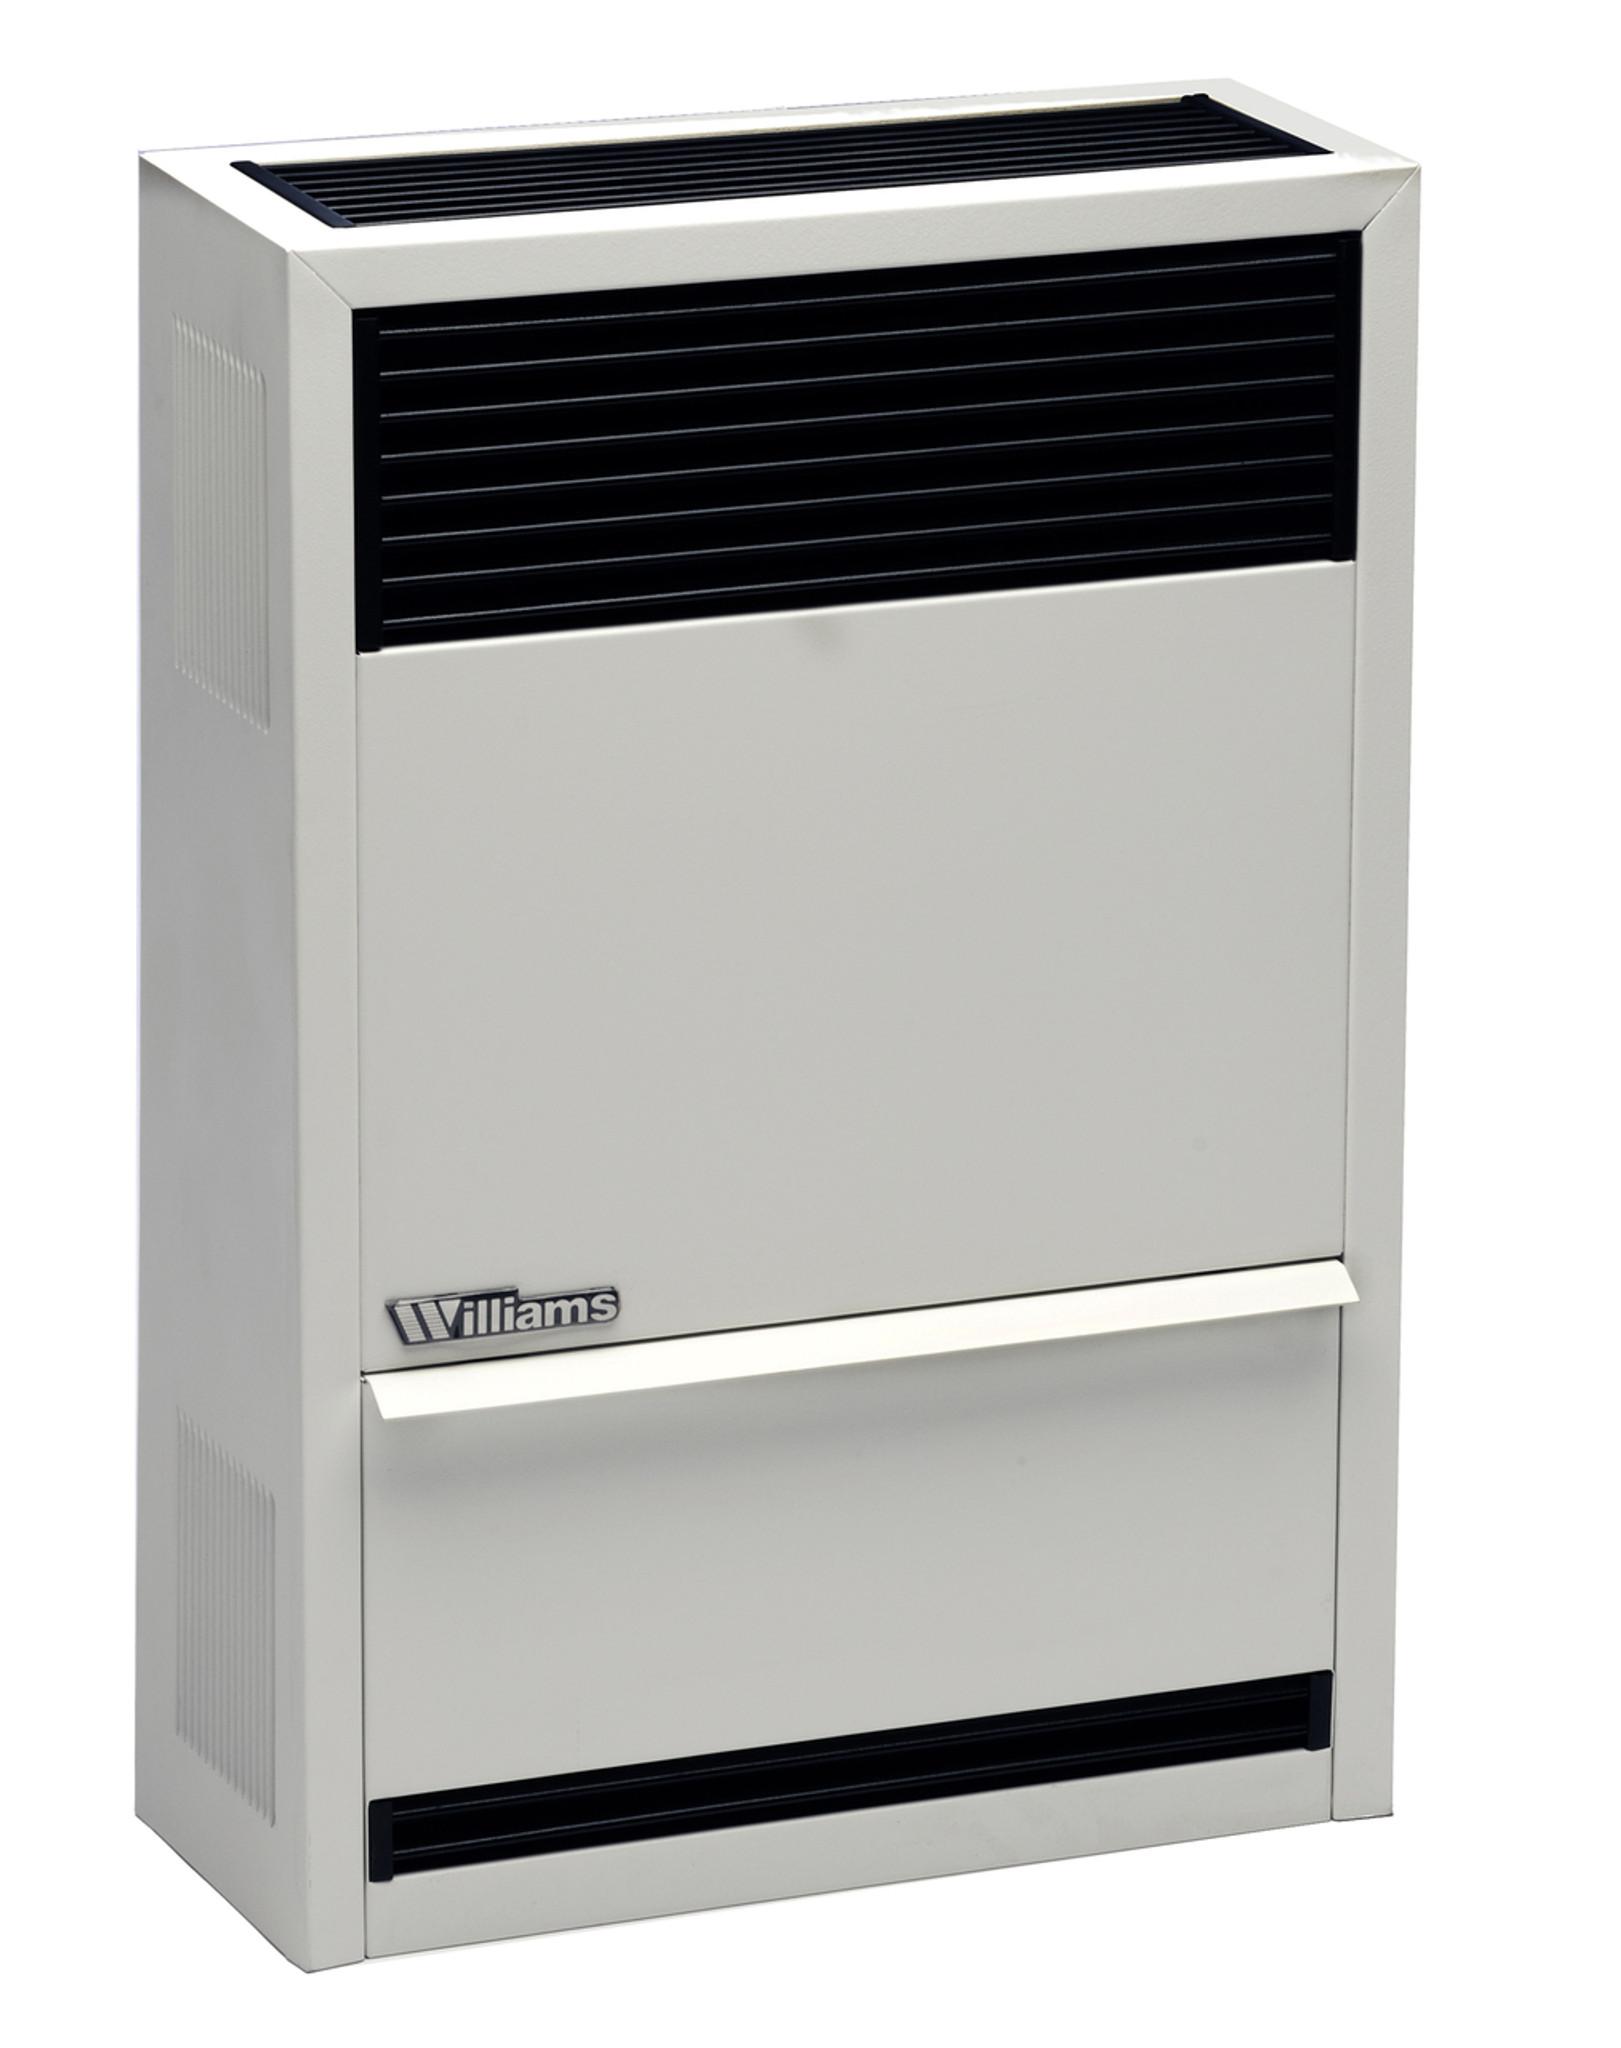 Williams Furnace Company 4309 Face Panel